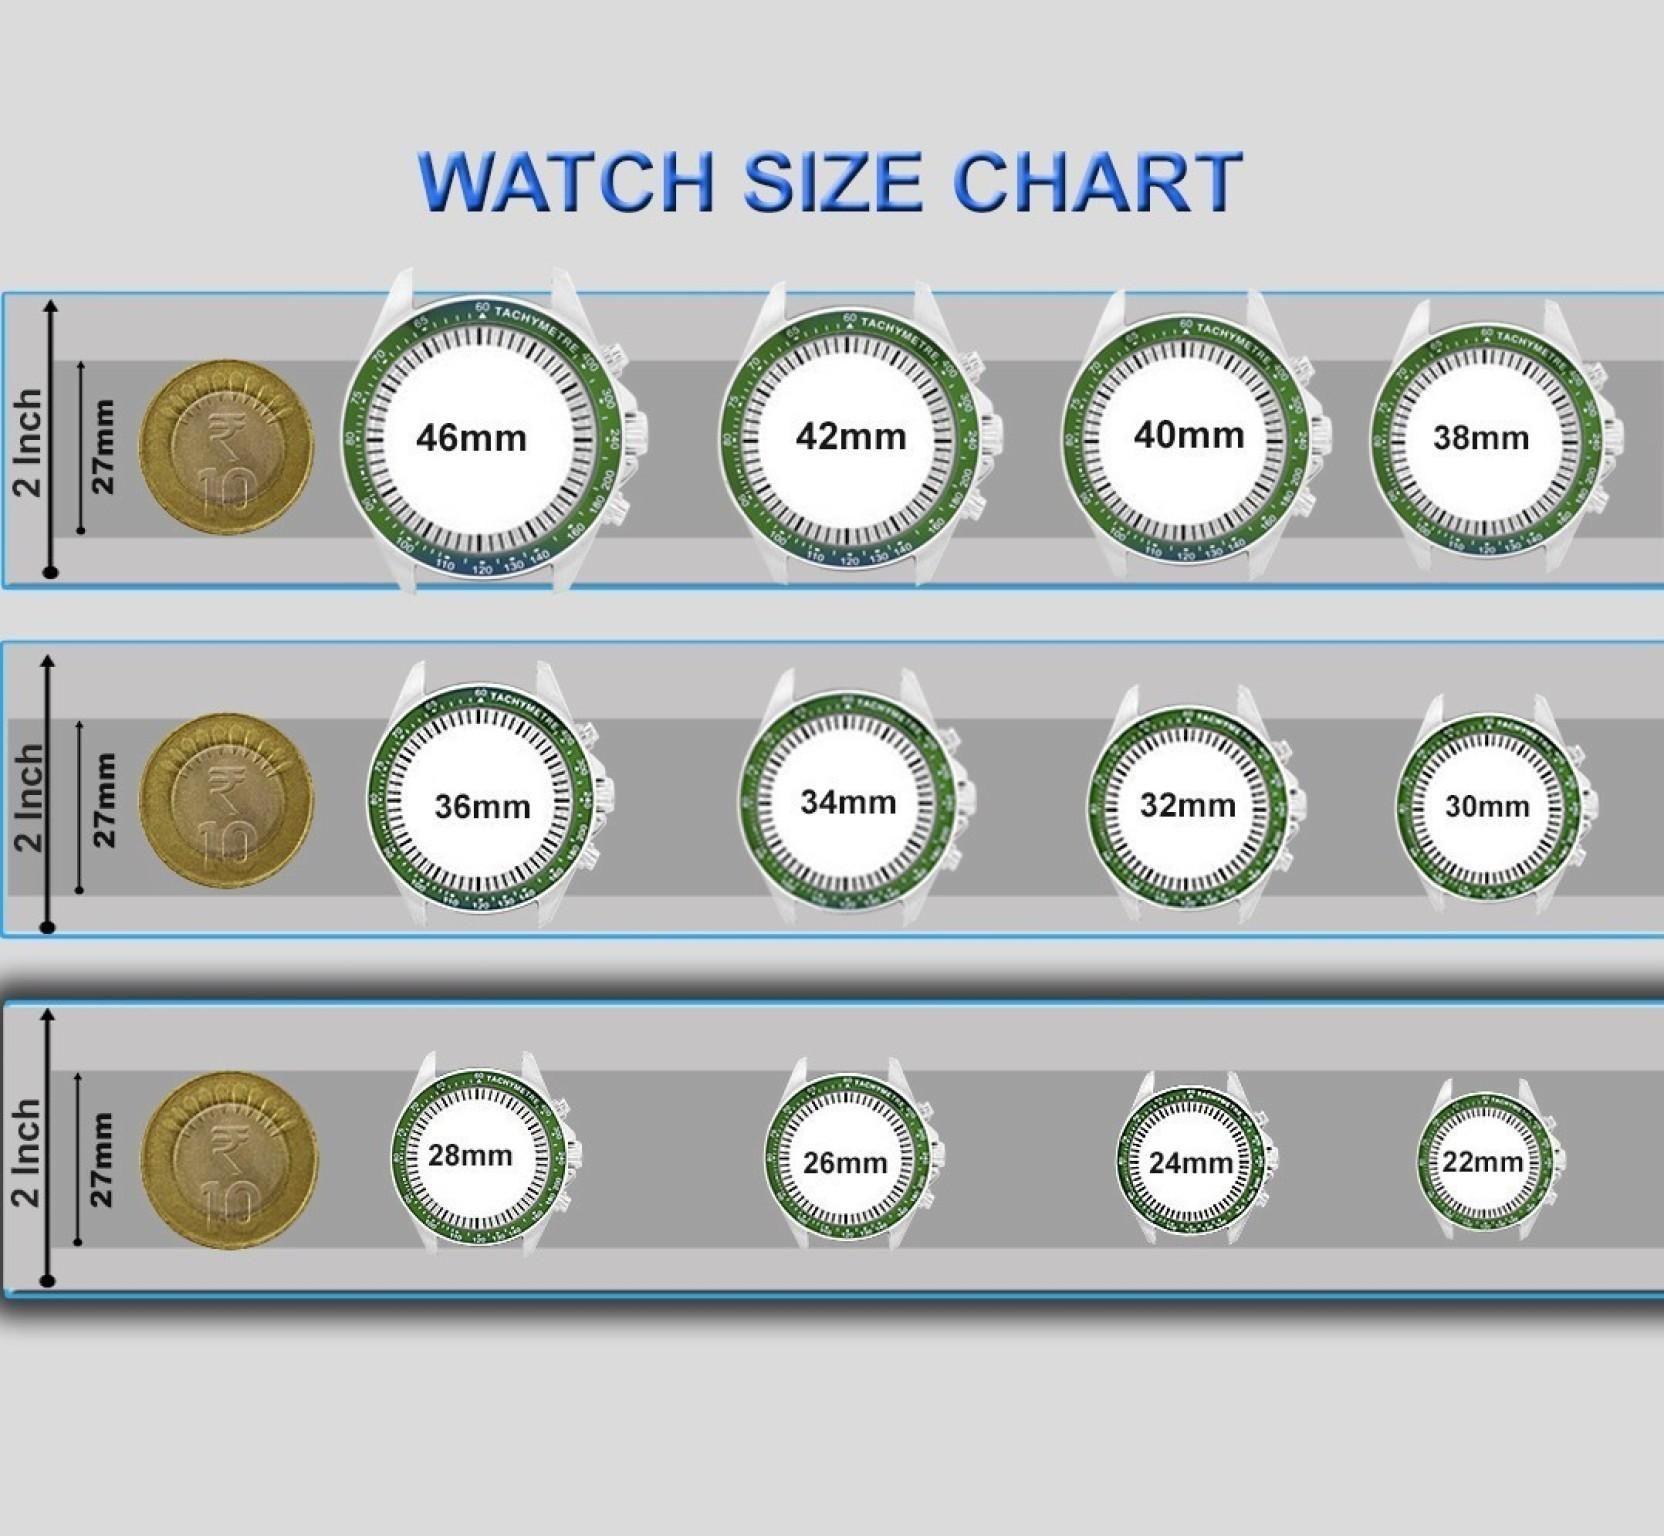 Fimex BX-CPW Watch - For Women